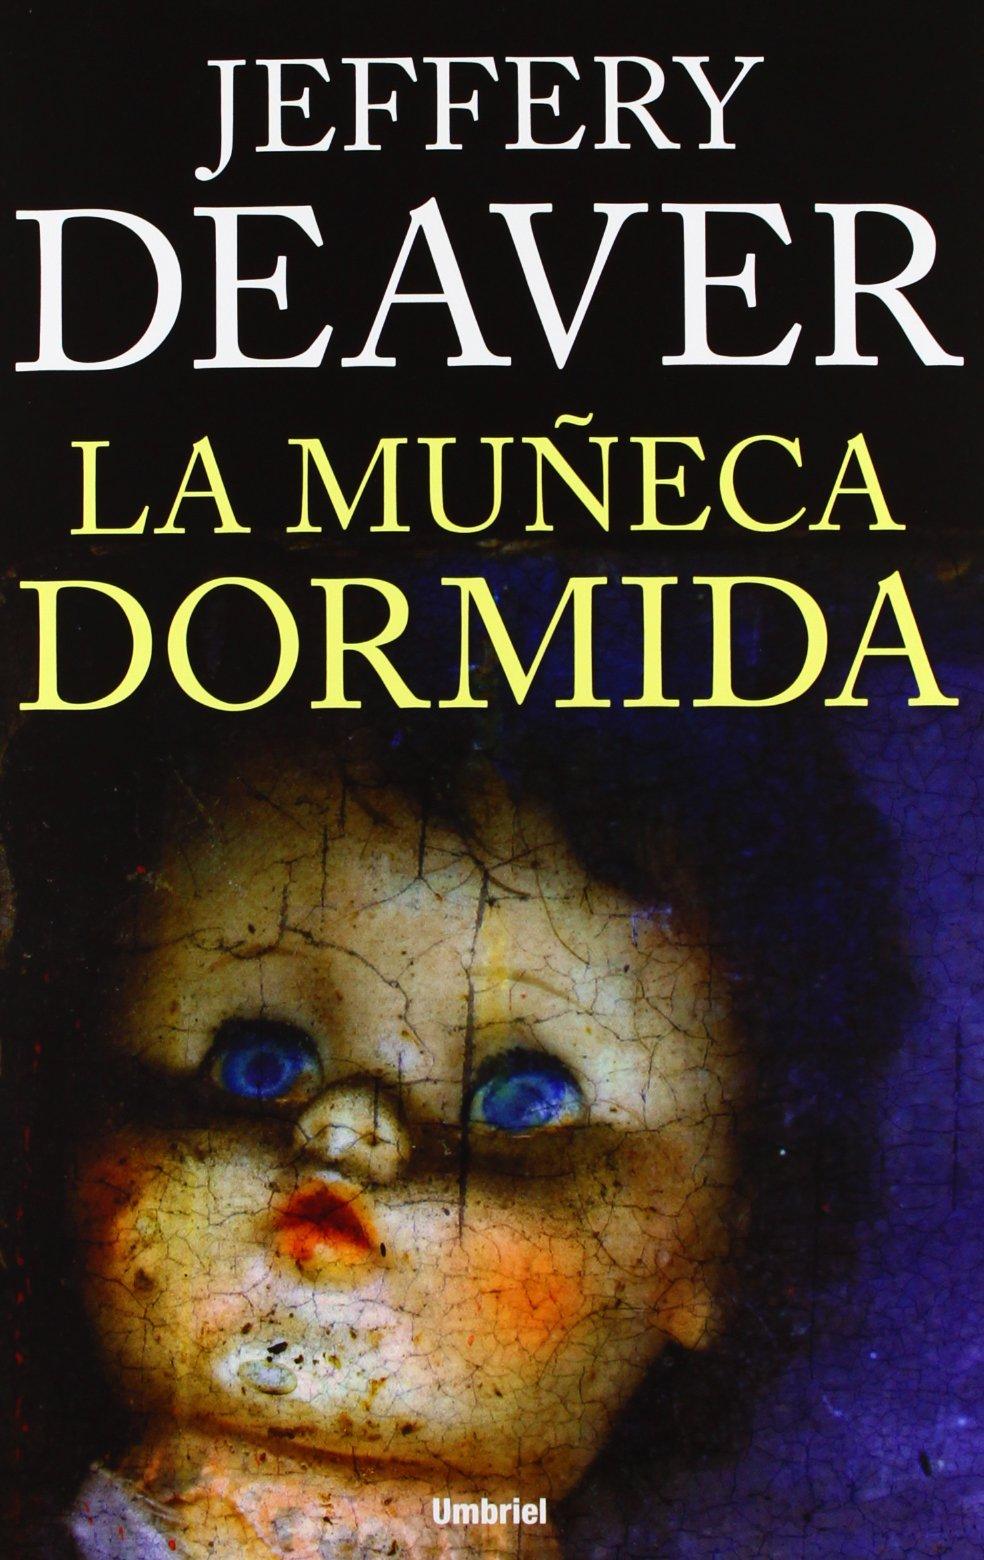 La Muneca Dormida (Spanish) Paperback – Jan 30 2013